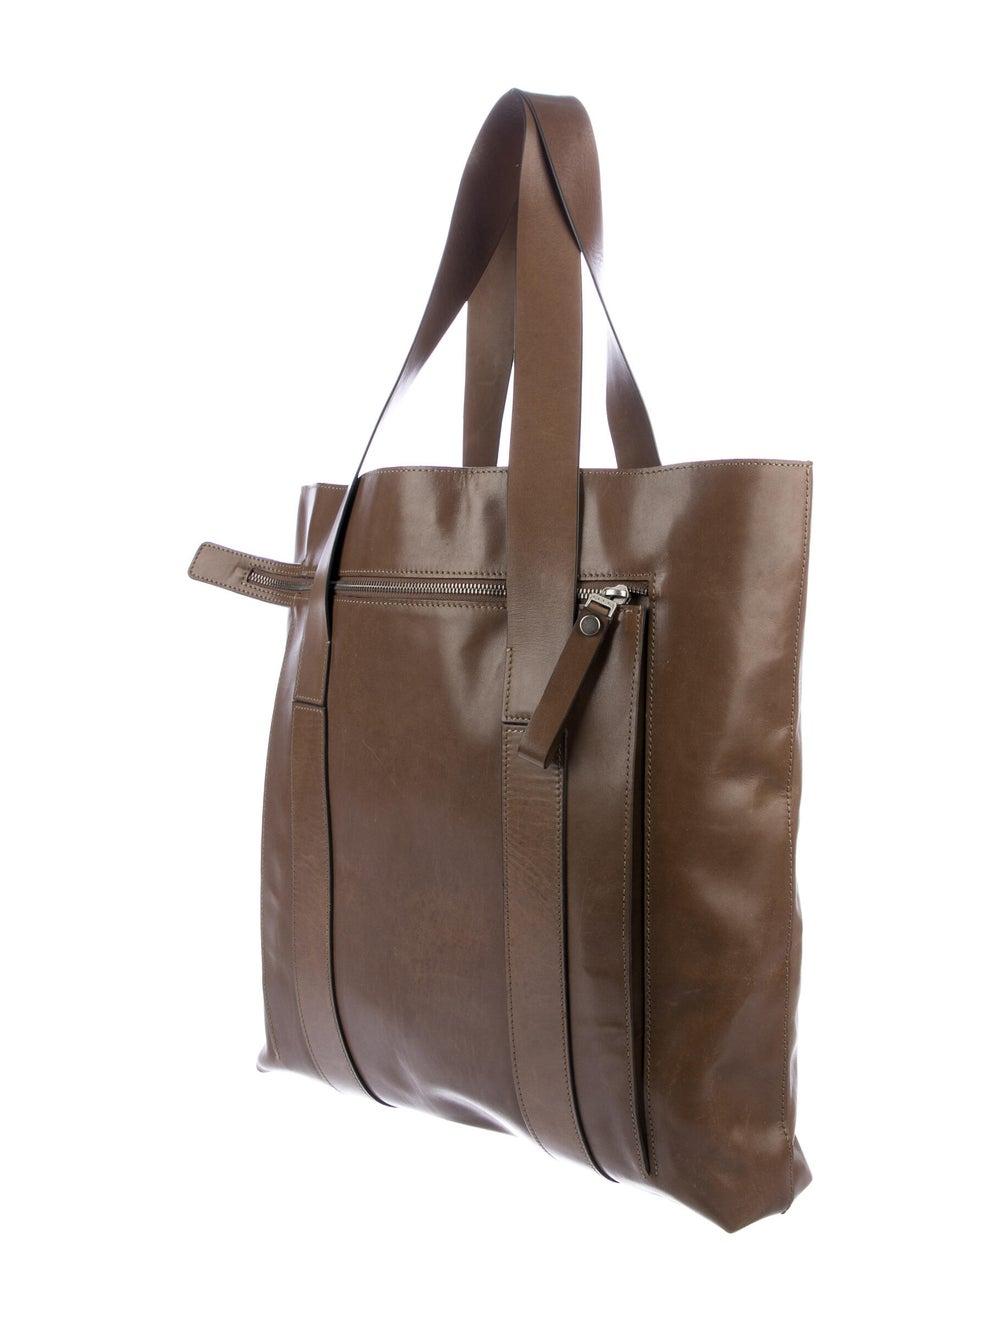 Marni Leather Tote Brown - image 3